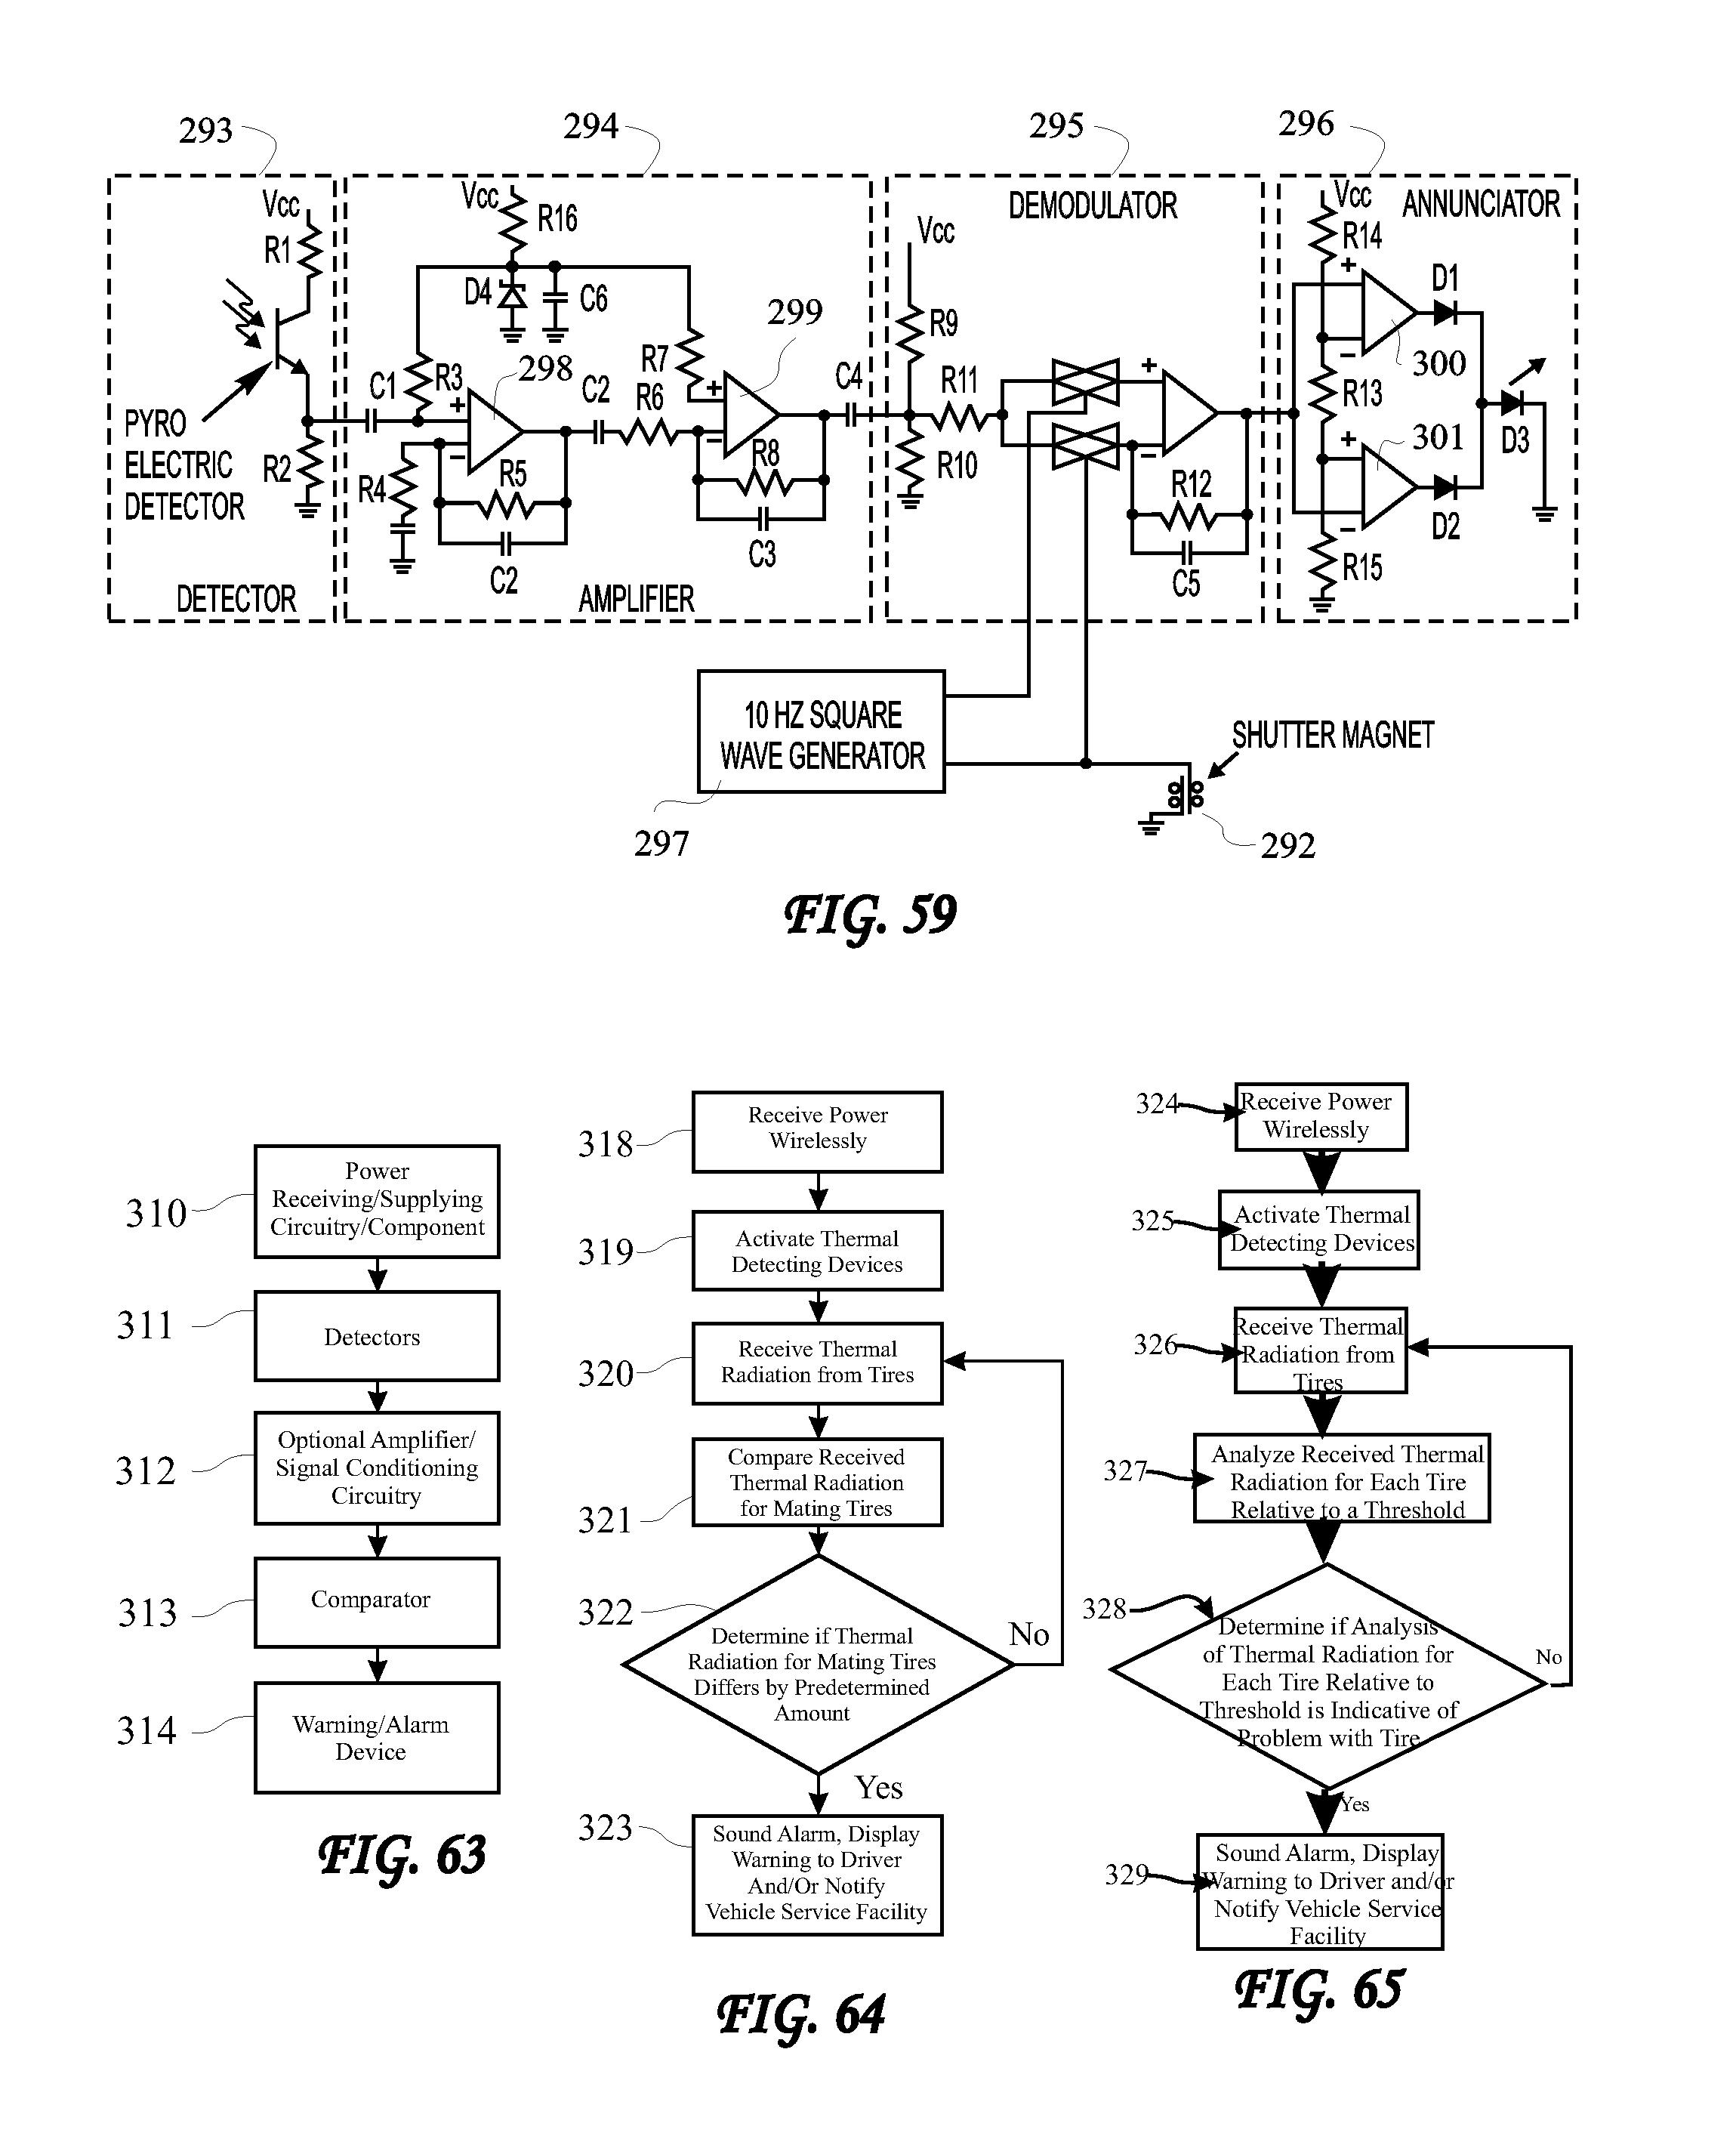 Patent Us 7313467 B2 Radiosparkscomschematics Indexcrystal Oscillators8 24 2016 Images